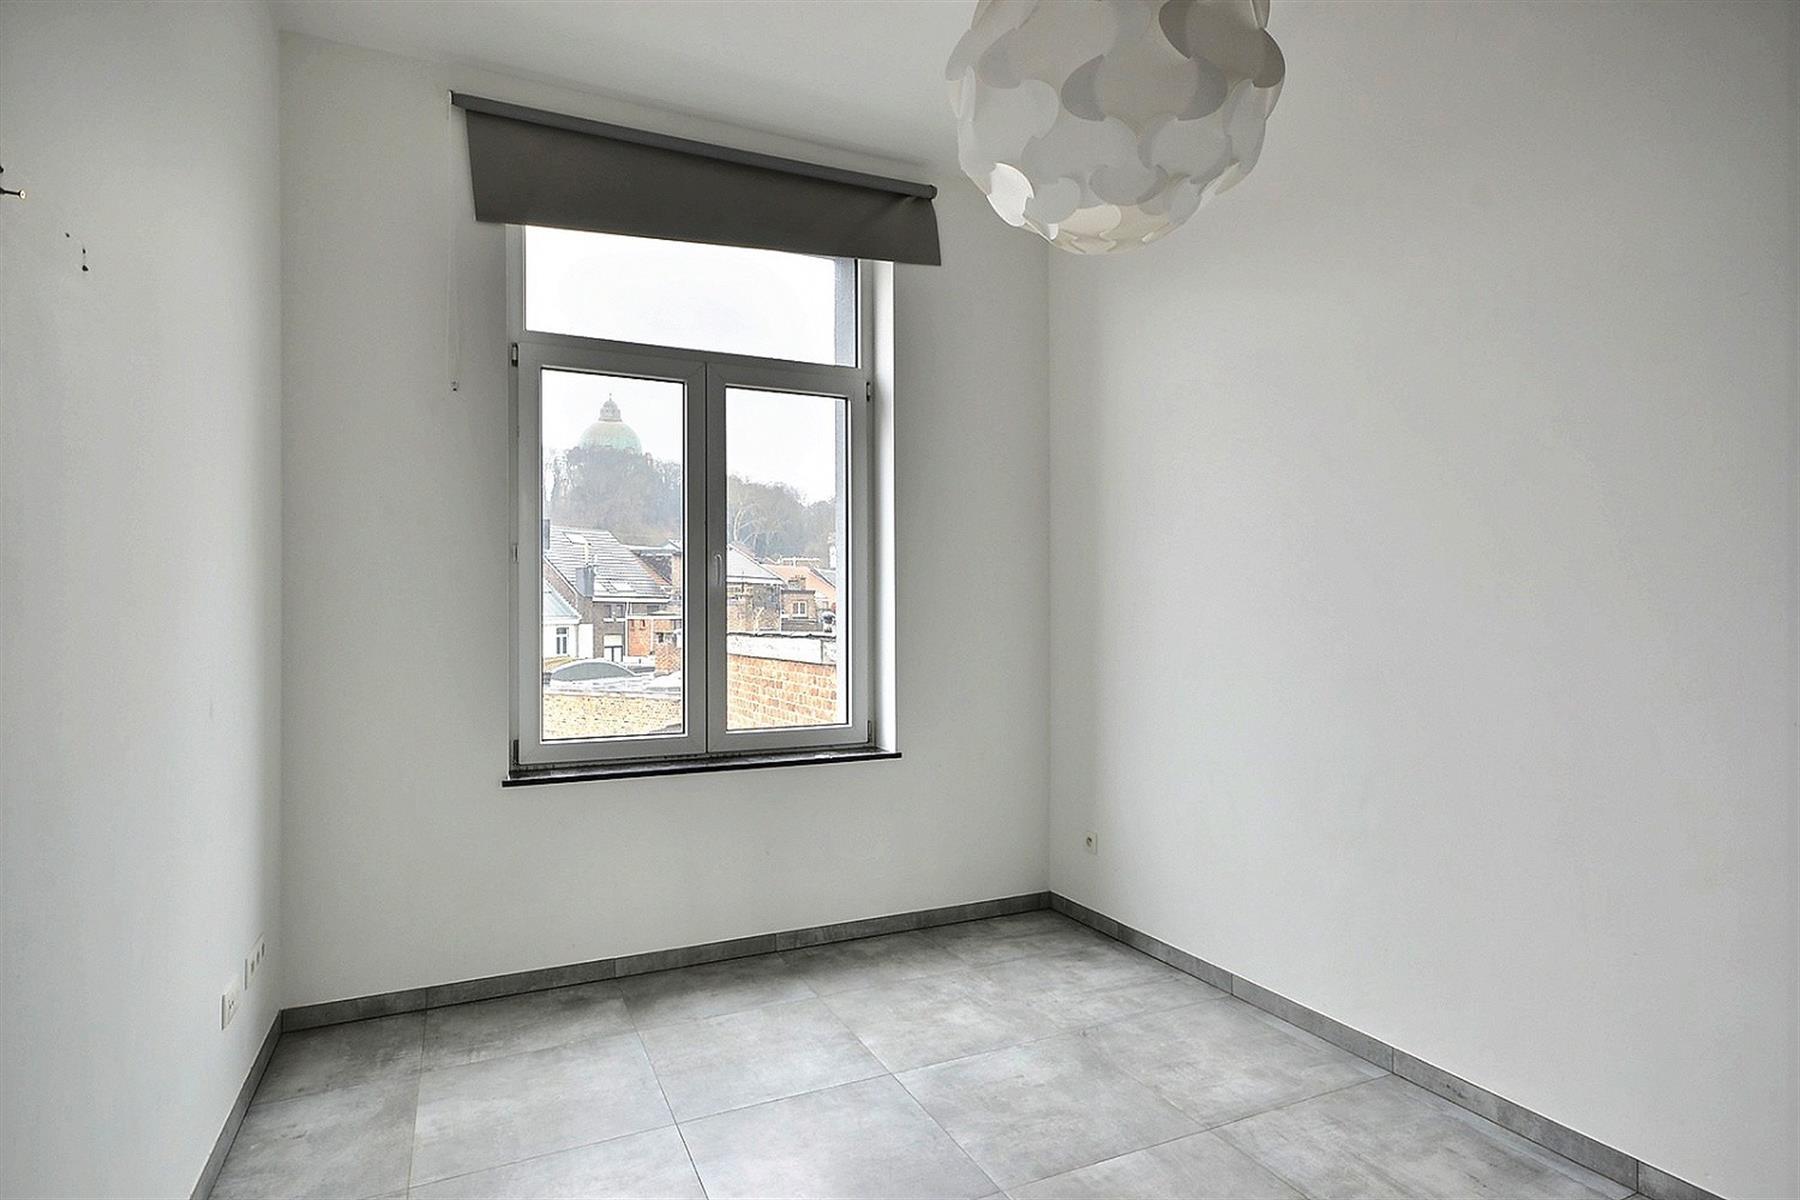 Appartement - LIÈGE - #4530417-5